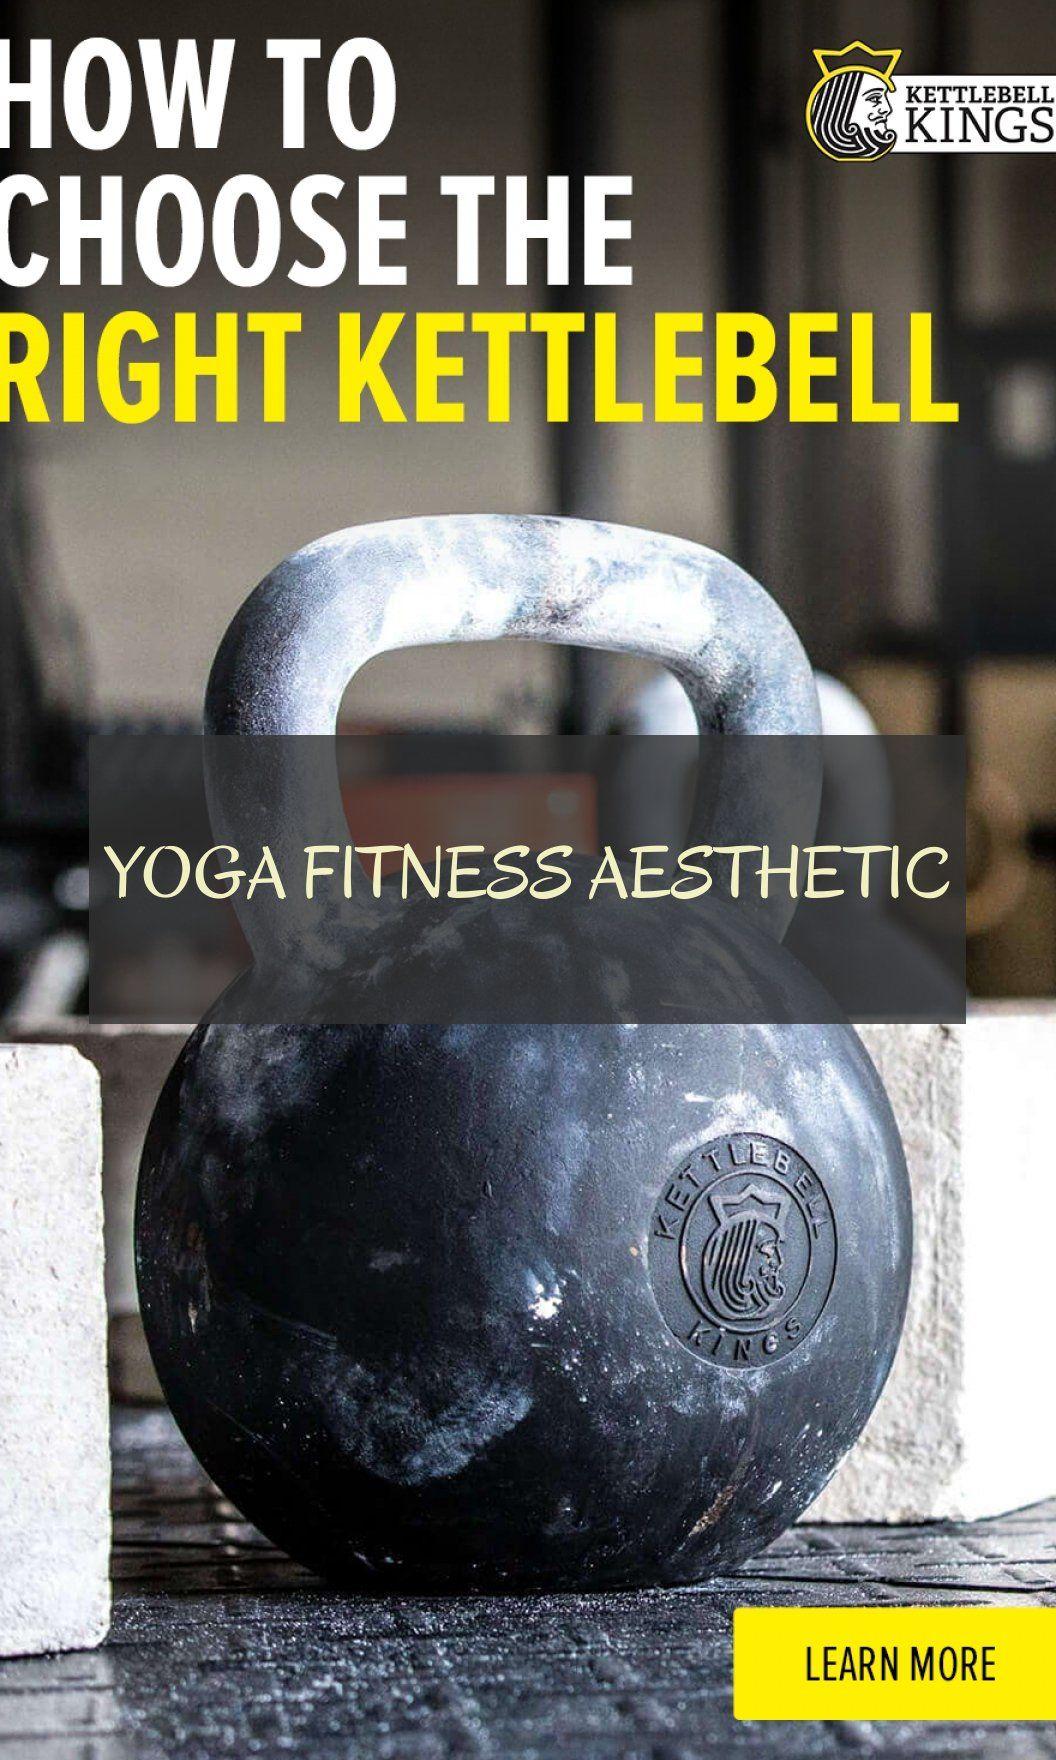 yoga fitness aesthetic #yoga #fitness #aesthetic